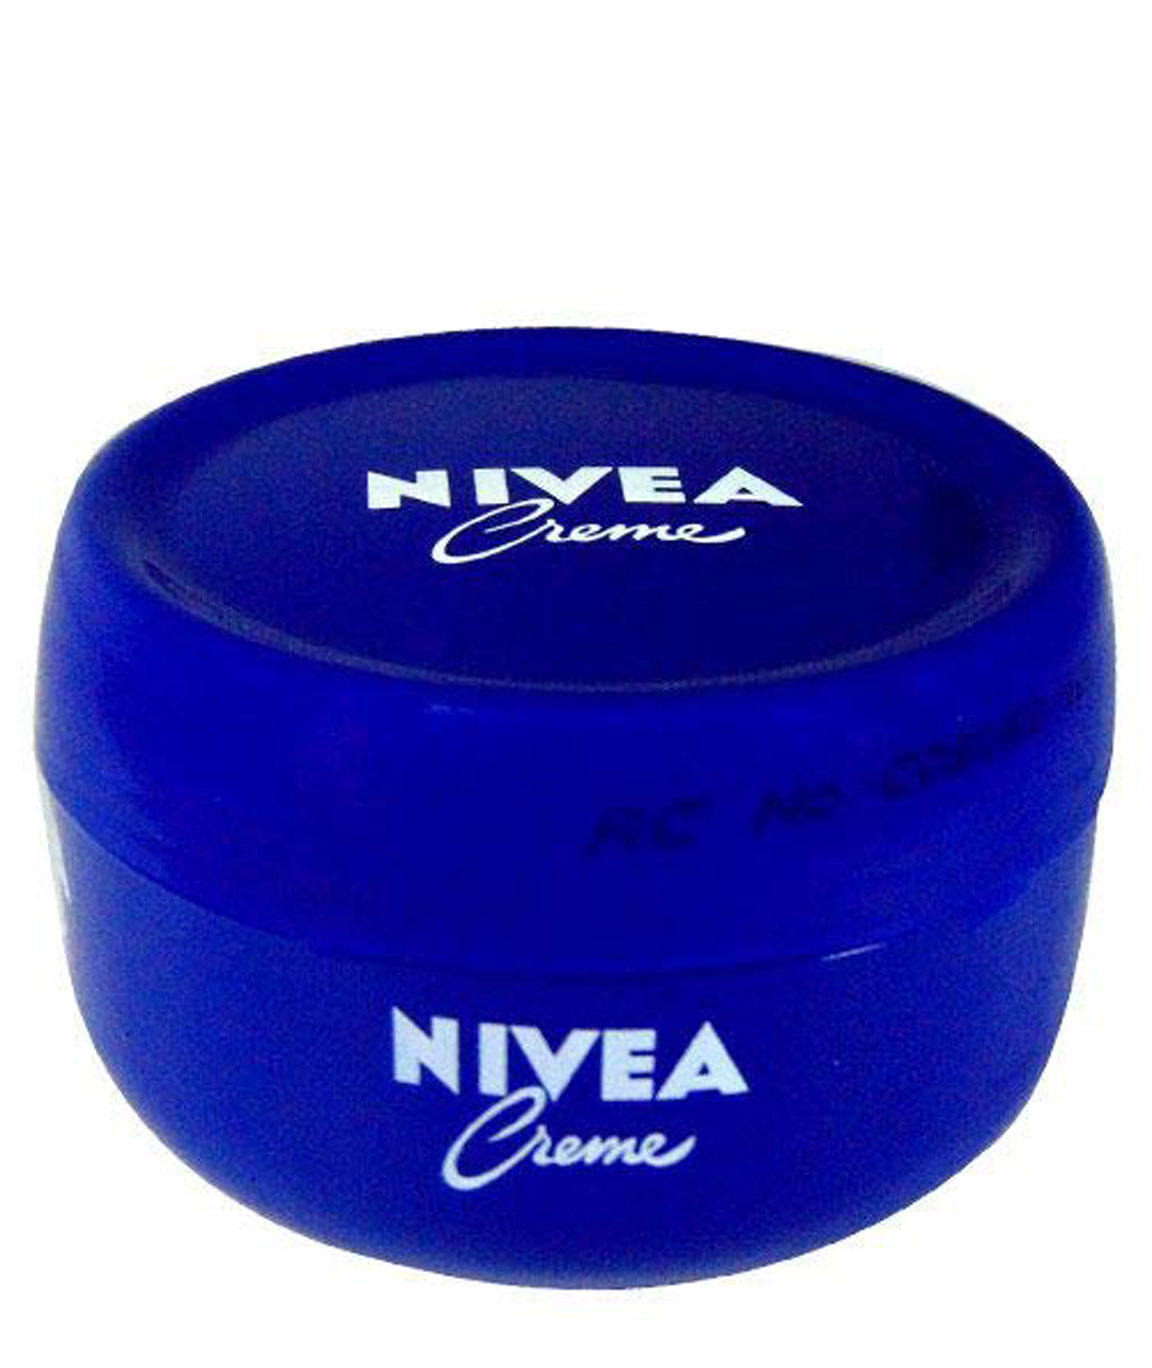 Nivea Cream Jar (100ml) (pack of 2)